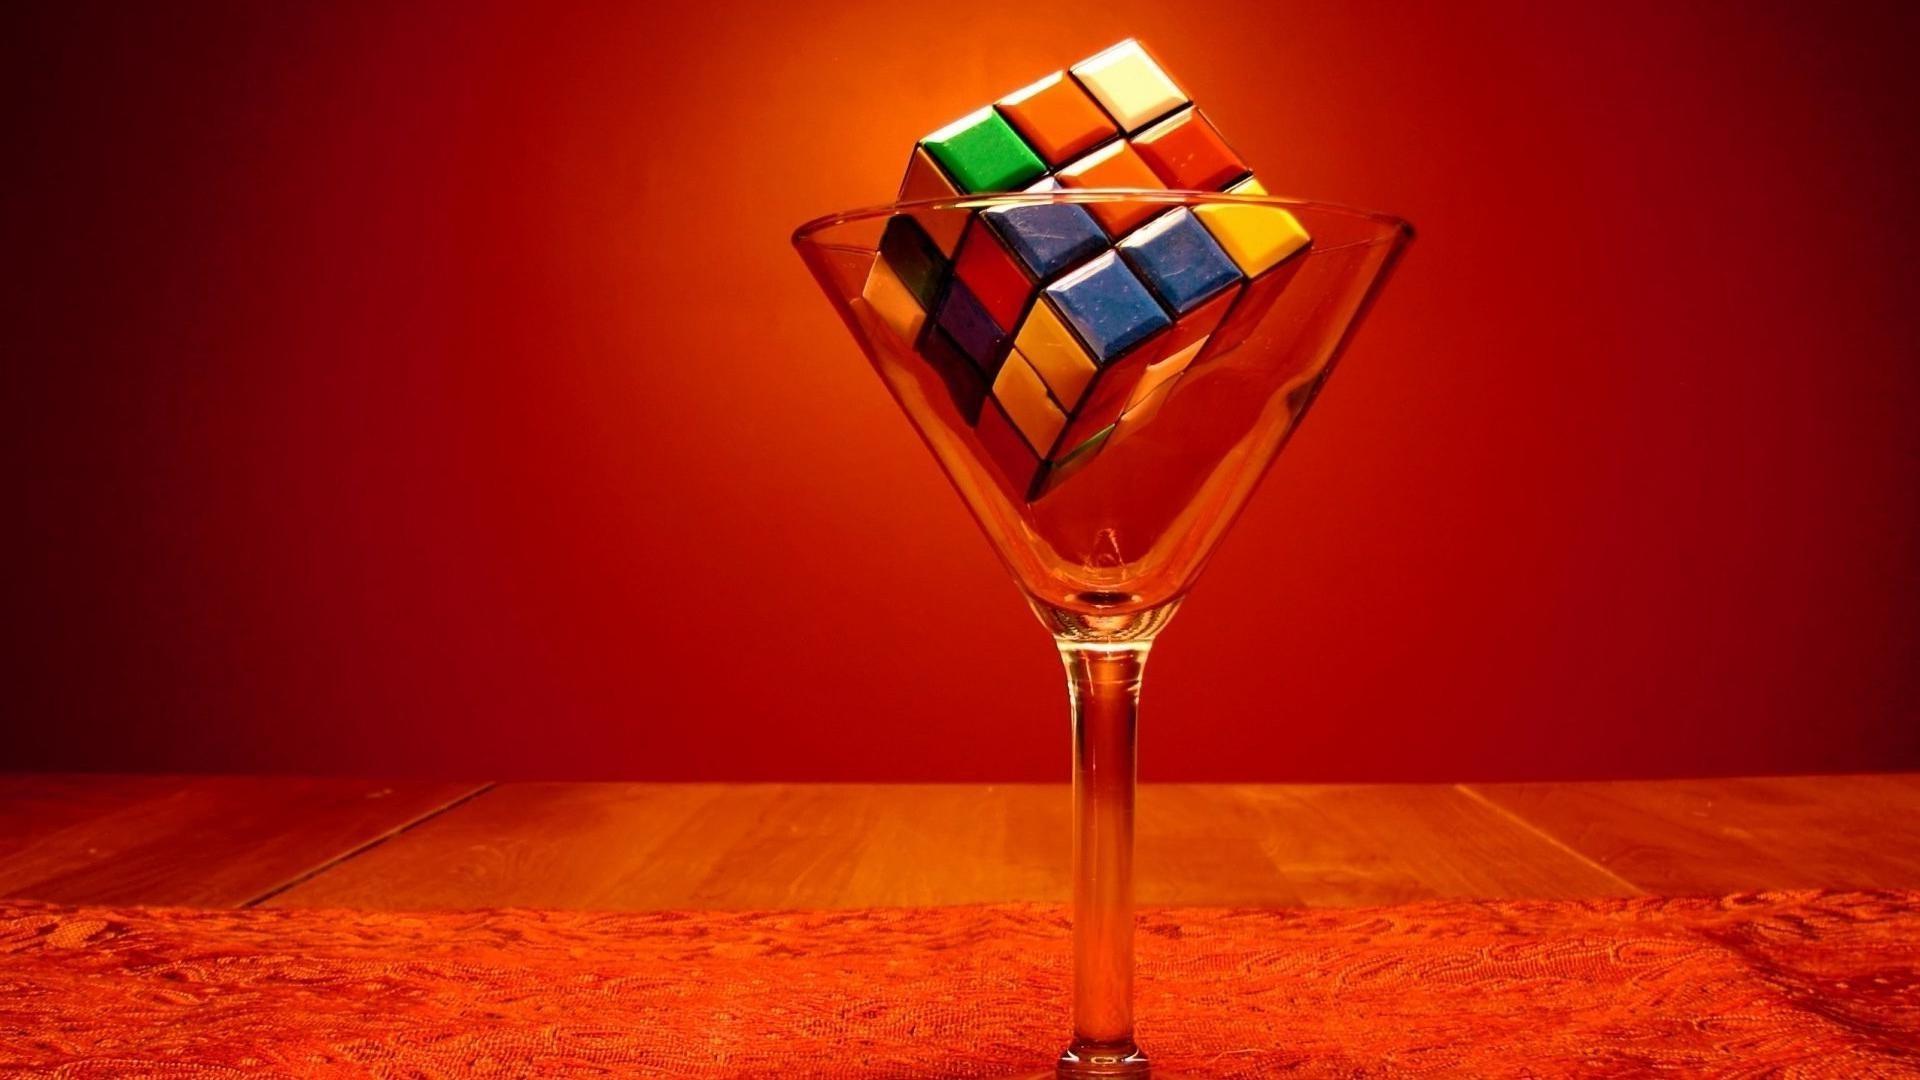 Rubiks cube in martini glass wallpaper, Rubiks cube in martini glass  Photography HD desktop wallpaper